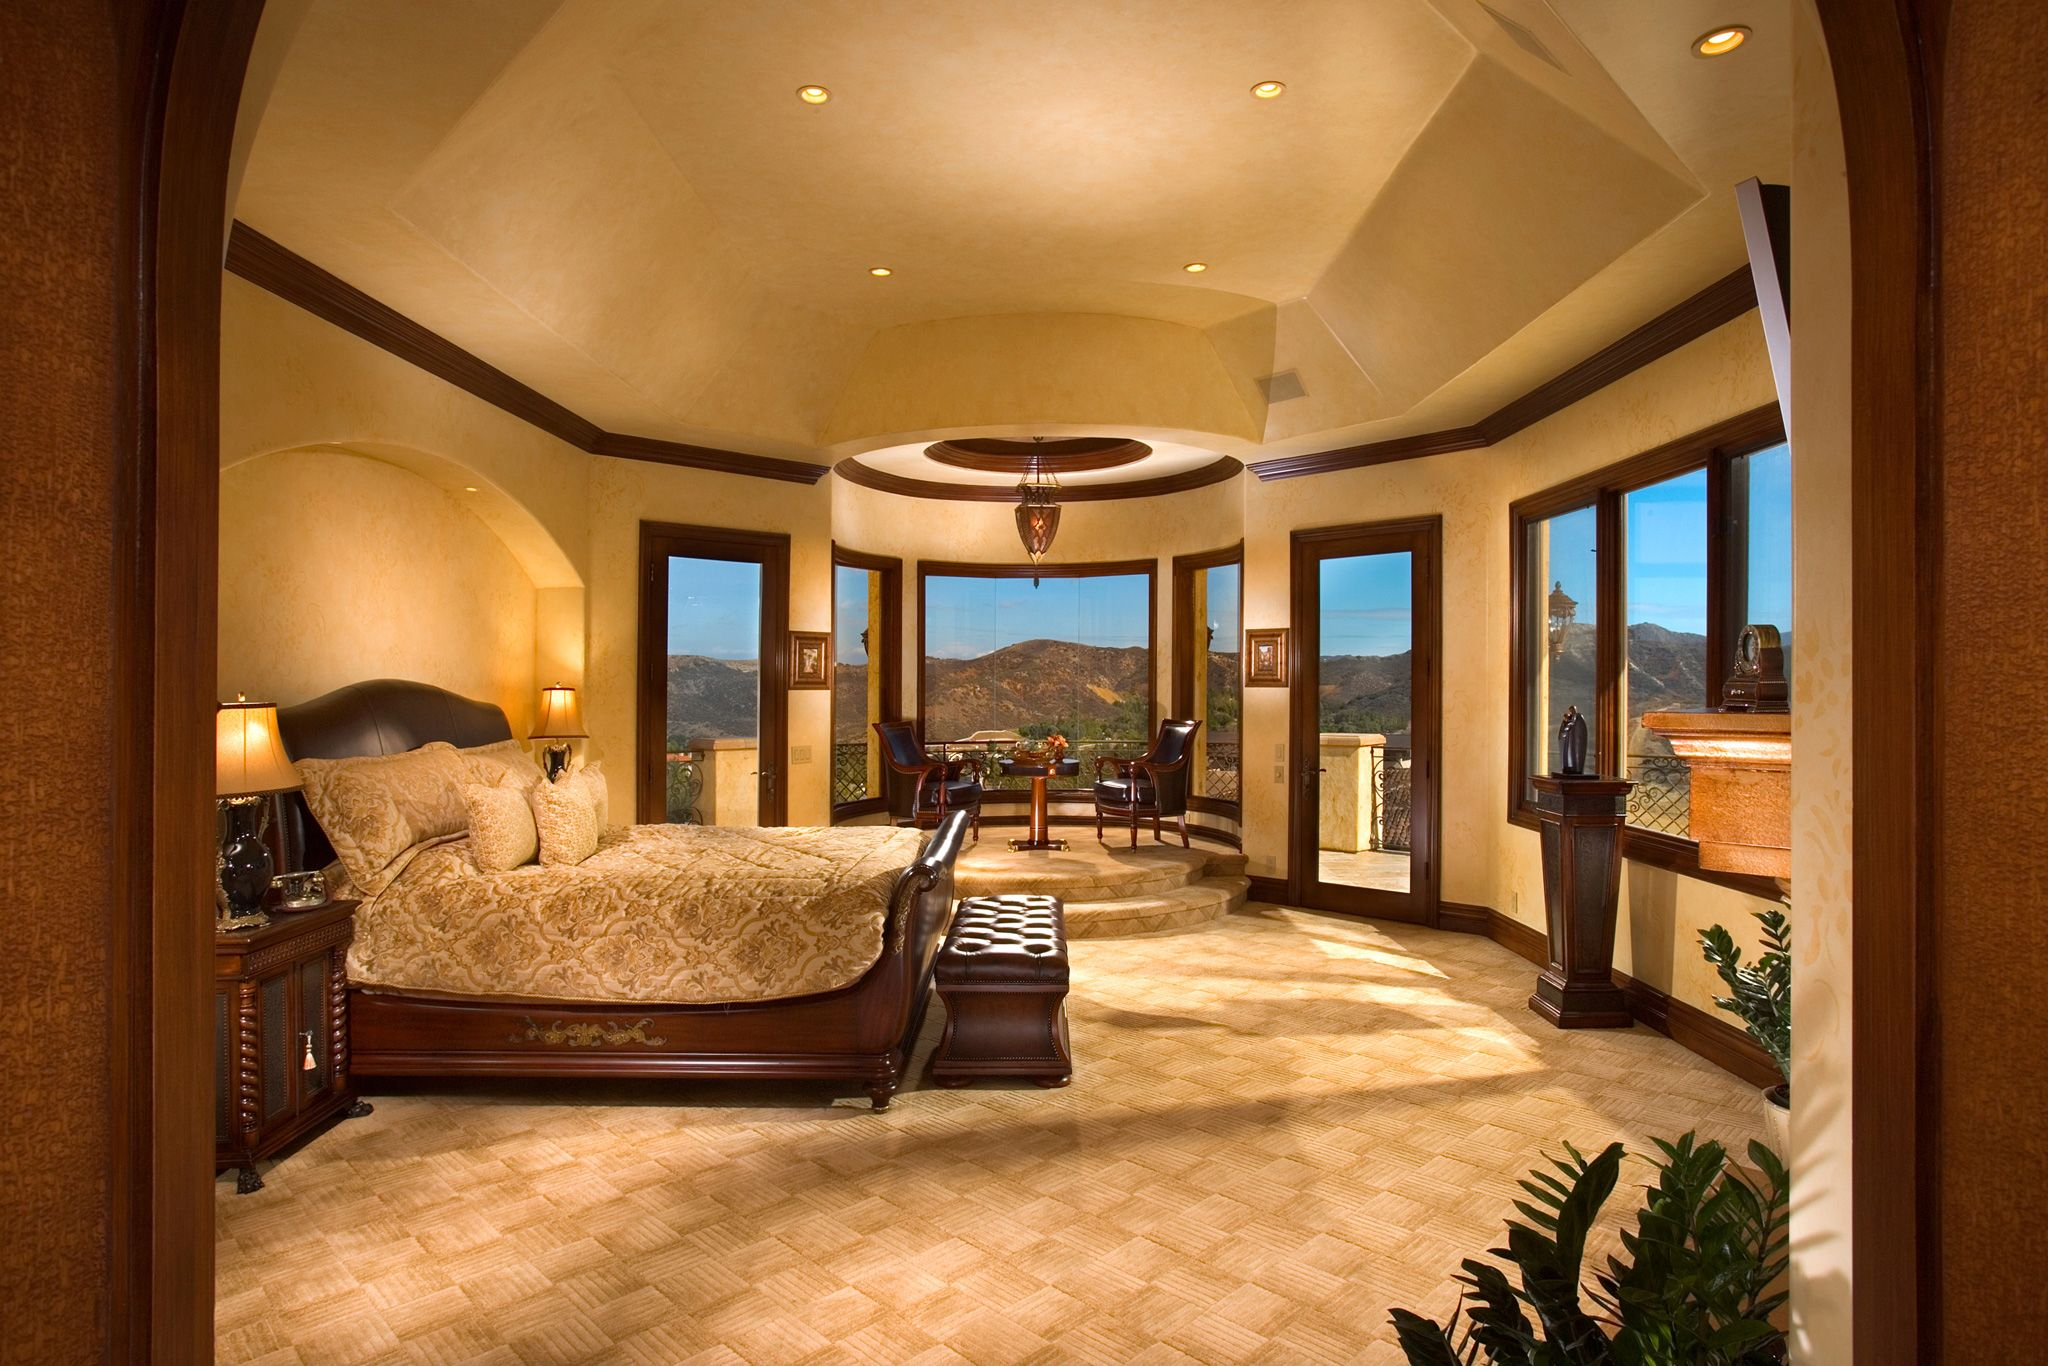 Master Bedroom of my dreams | Dream house-master bed/bath ...